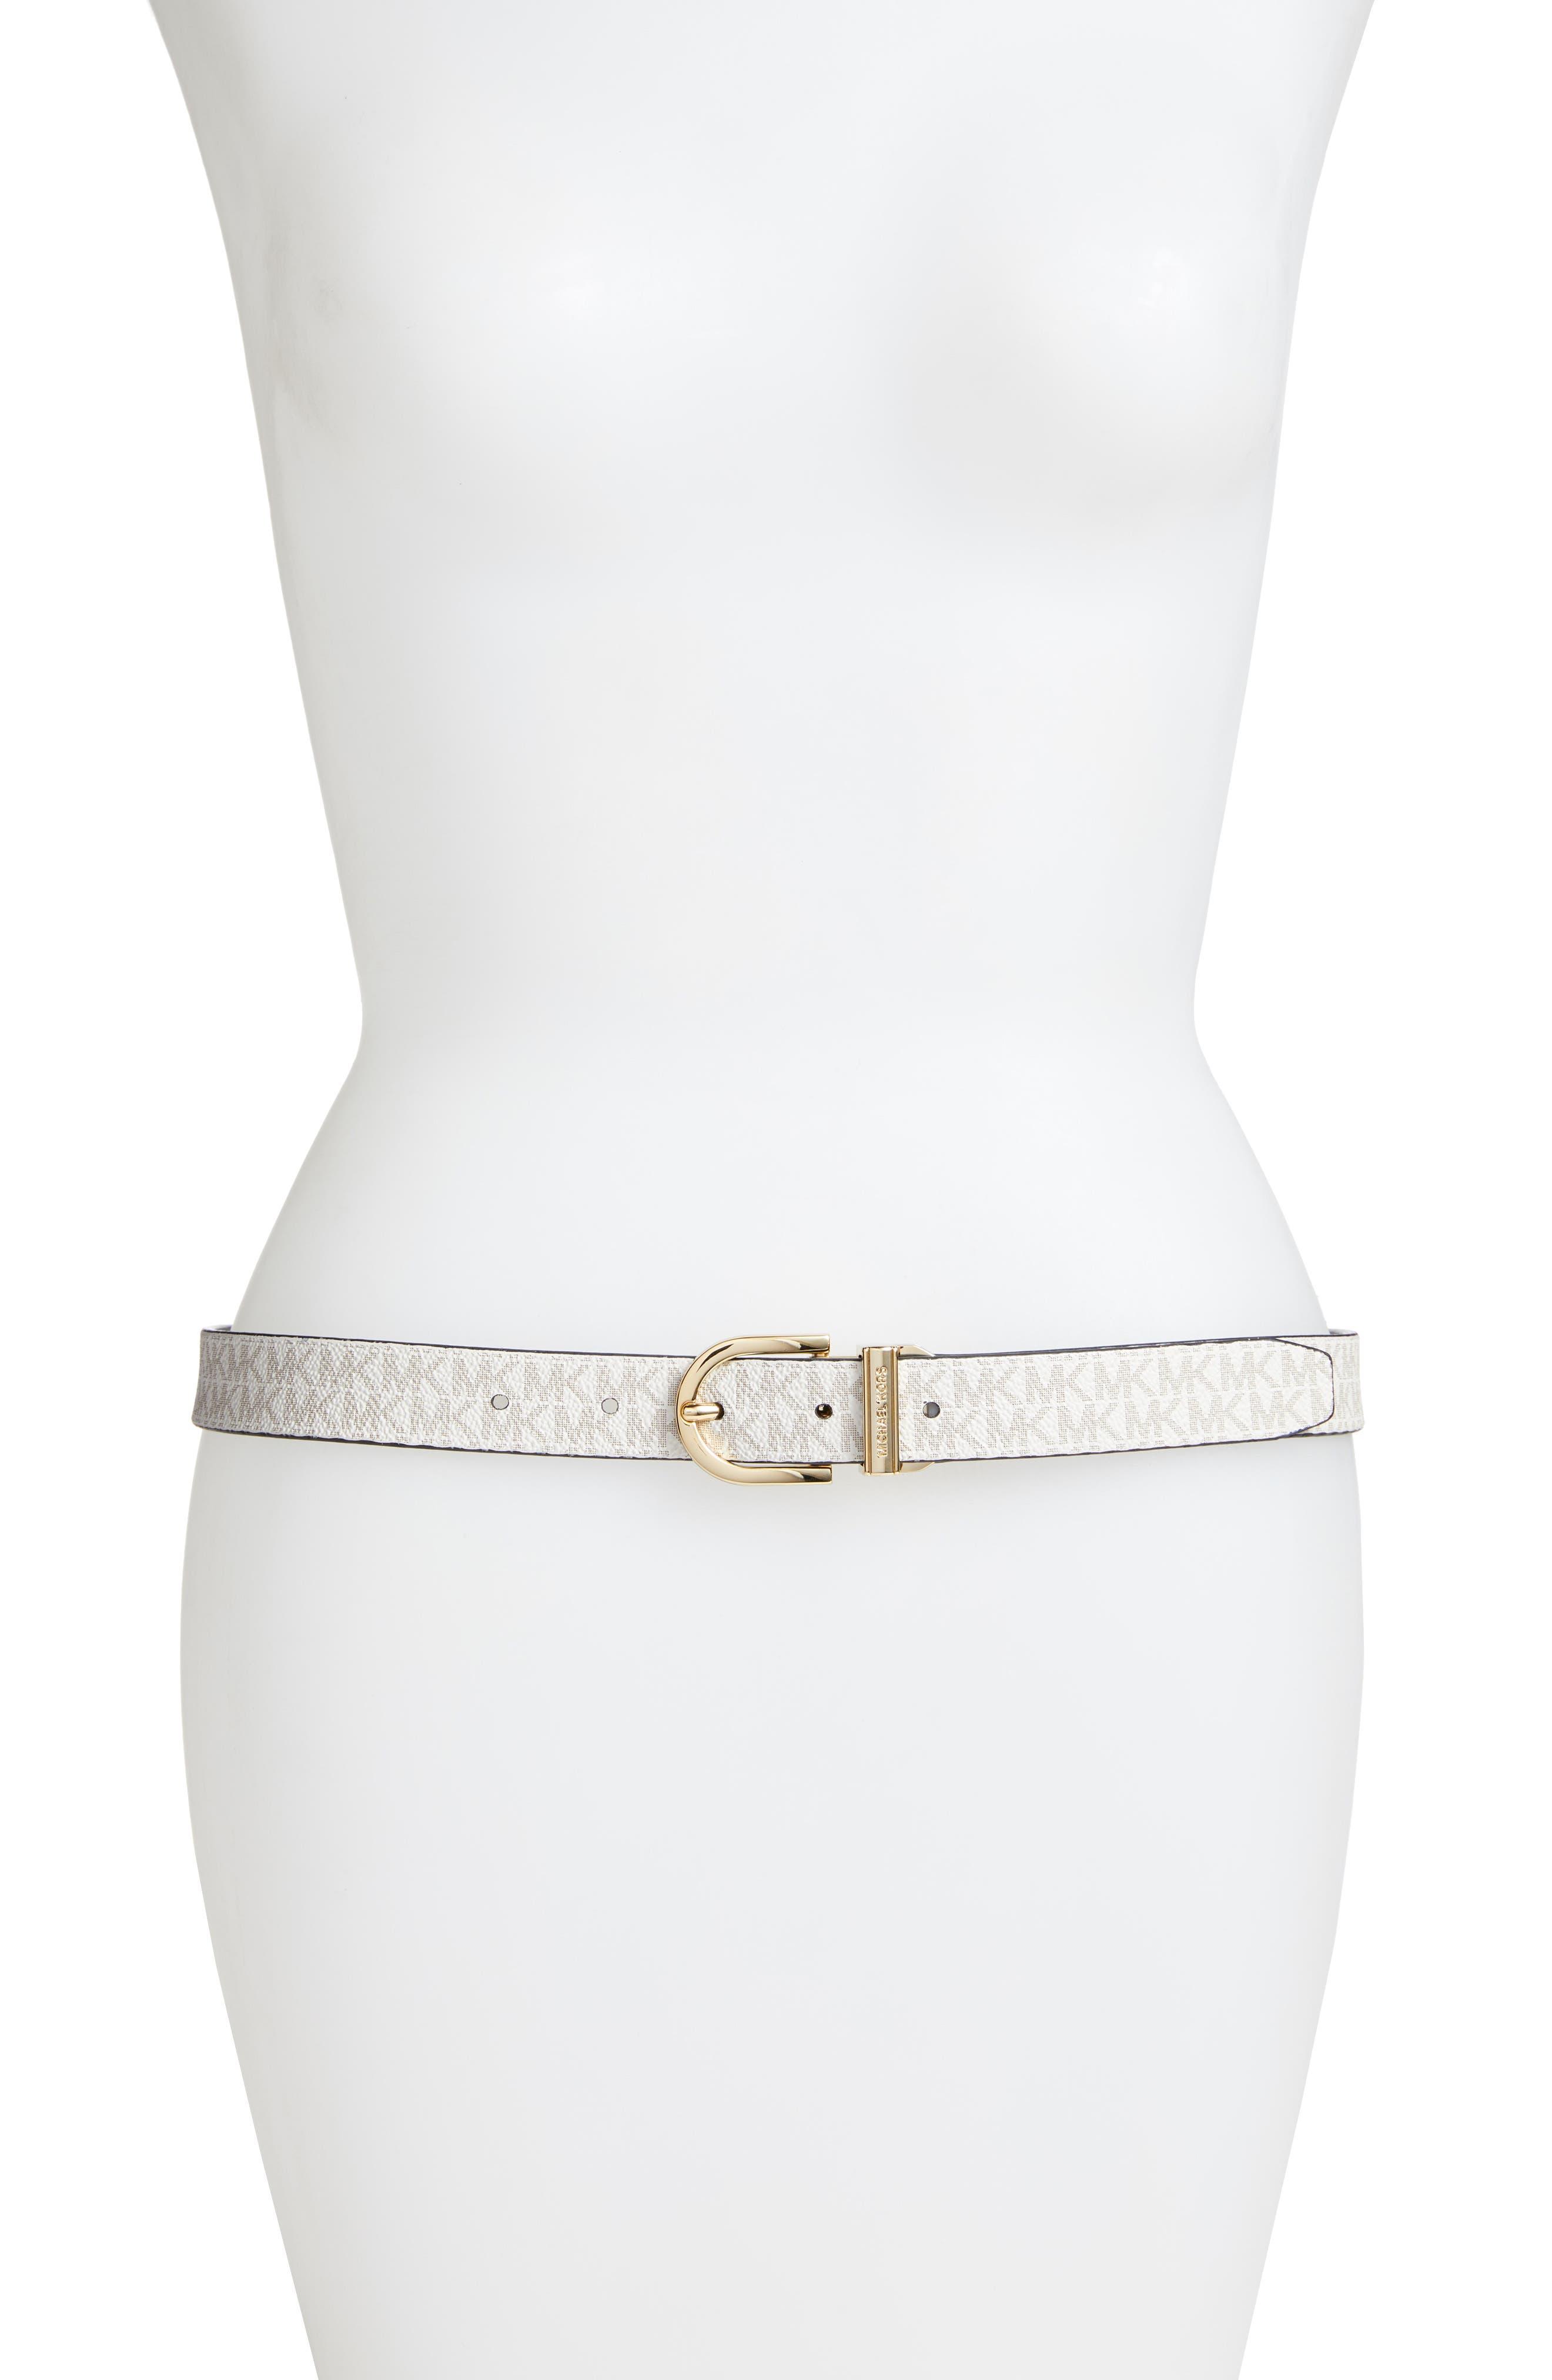 Reversible Leather Belt,                             Alternate thumbnail 3, color,                             NAVY / VANILLA